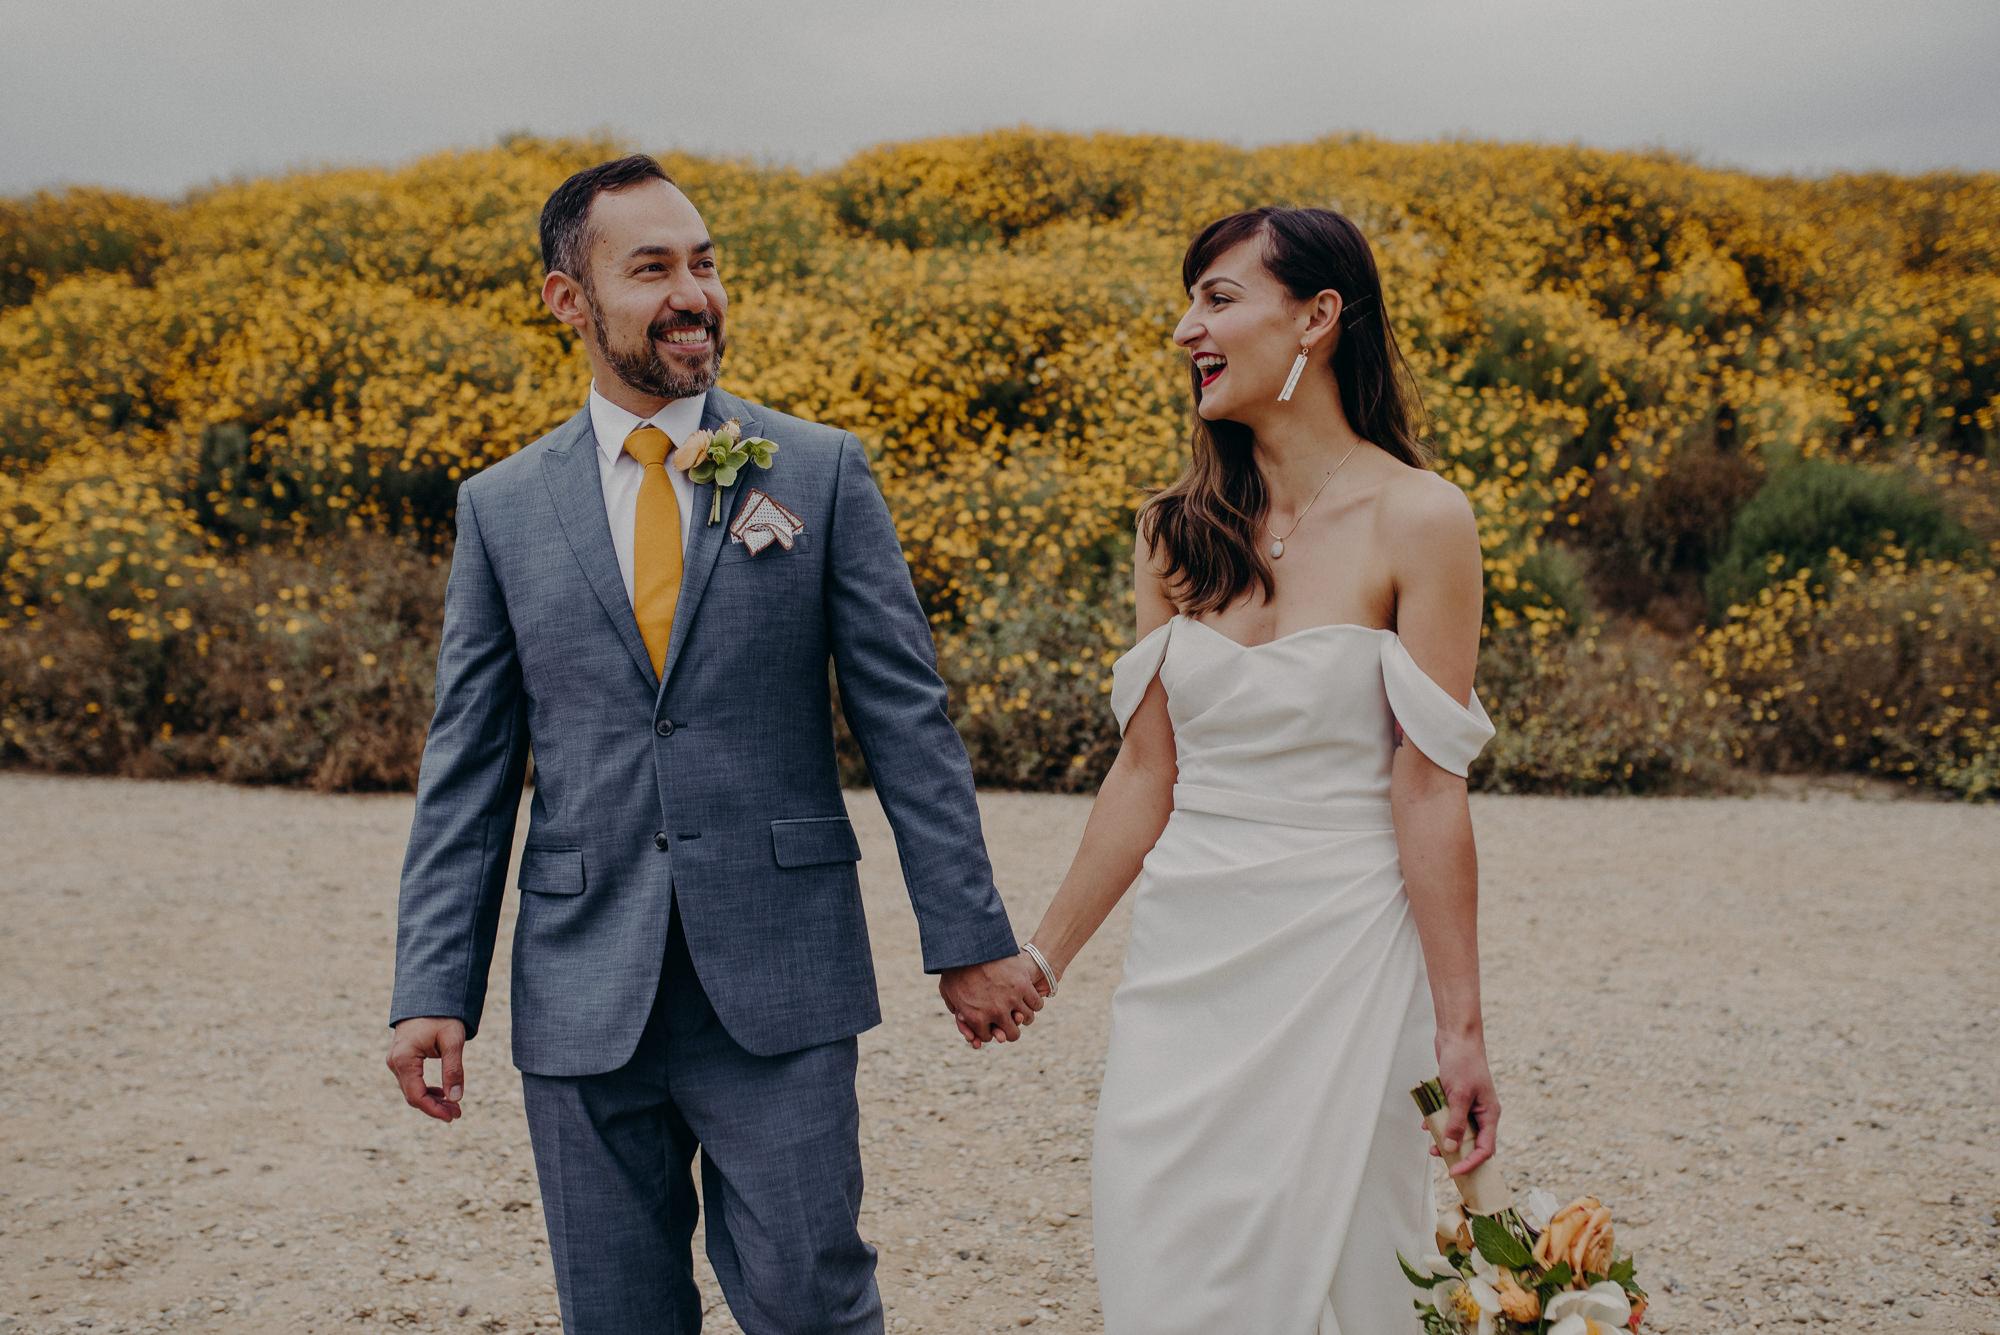 elopement photographer in los angeles - la wedding photographer - isaiahandtaylor.com-022.jpg